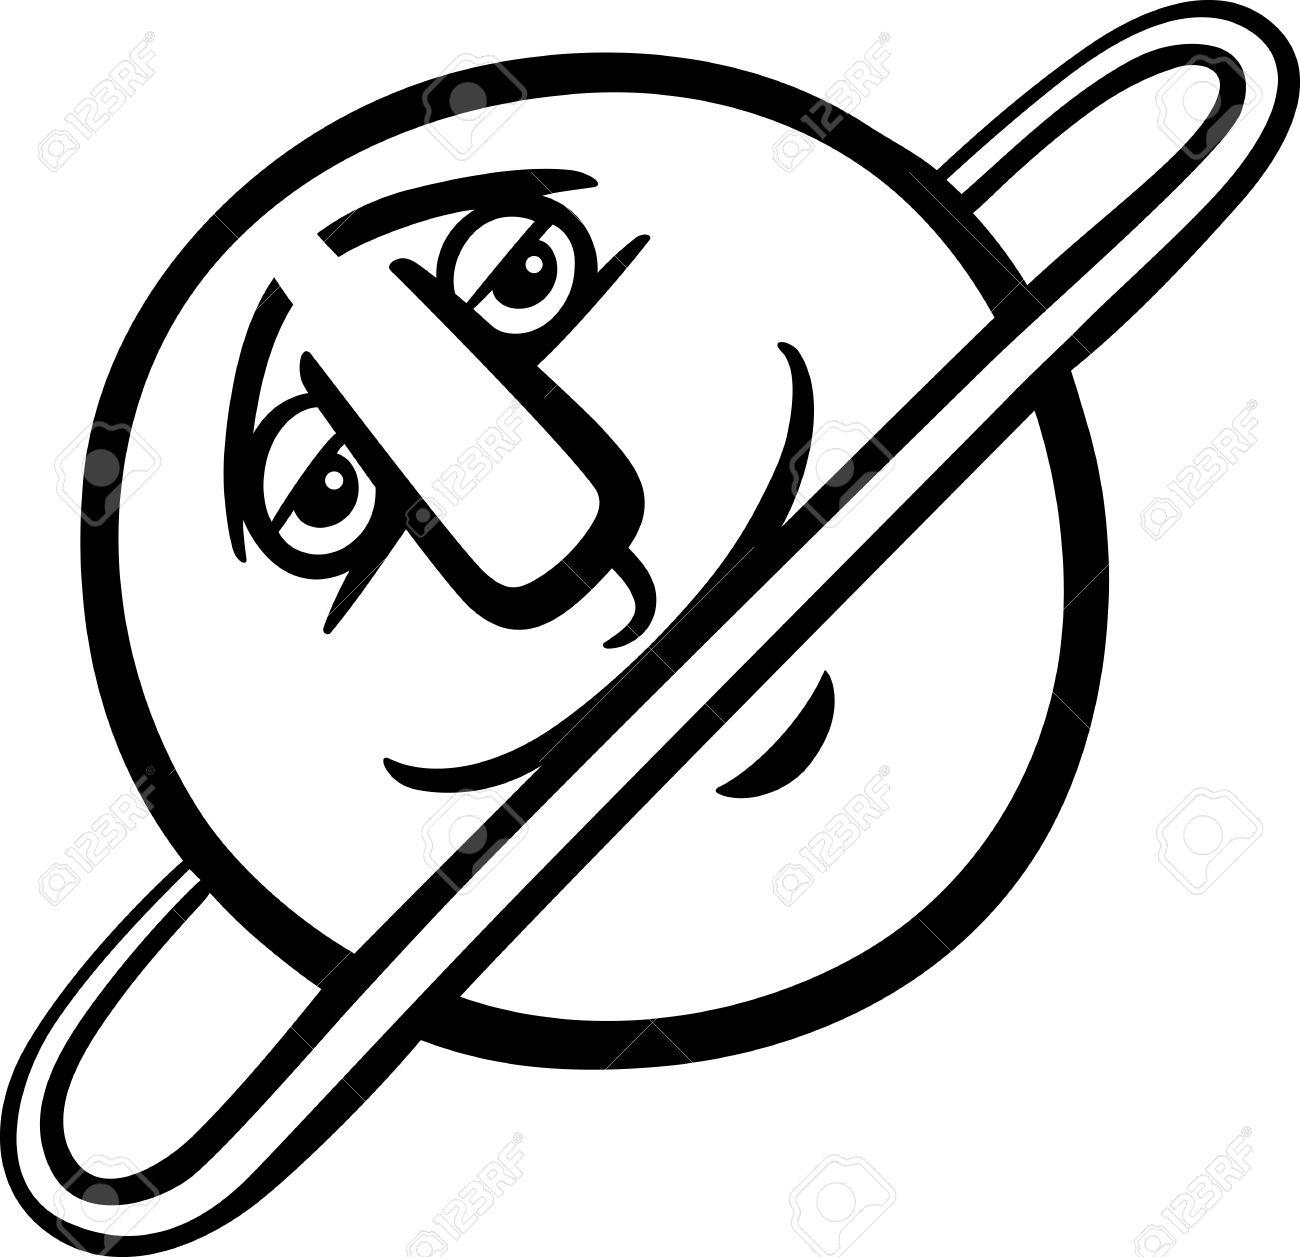 1300x1257 Black And White Cartoon Illustration Of Funny Uranus Planet Comic